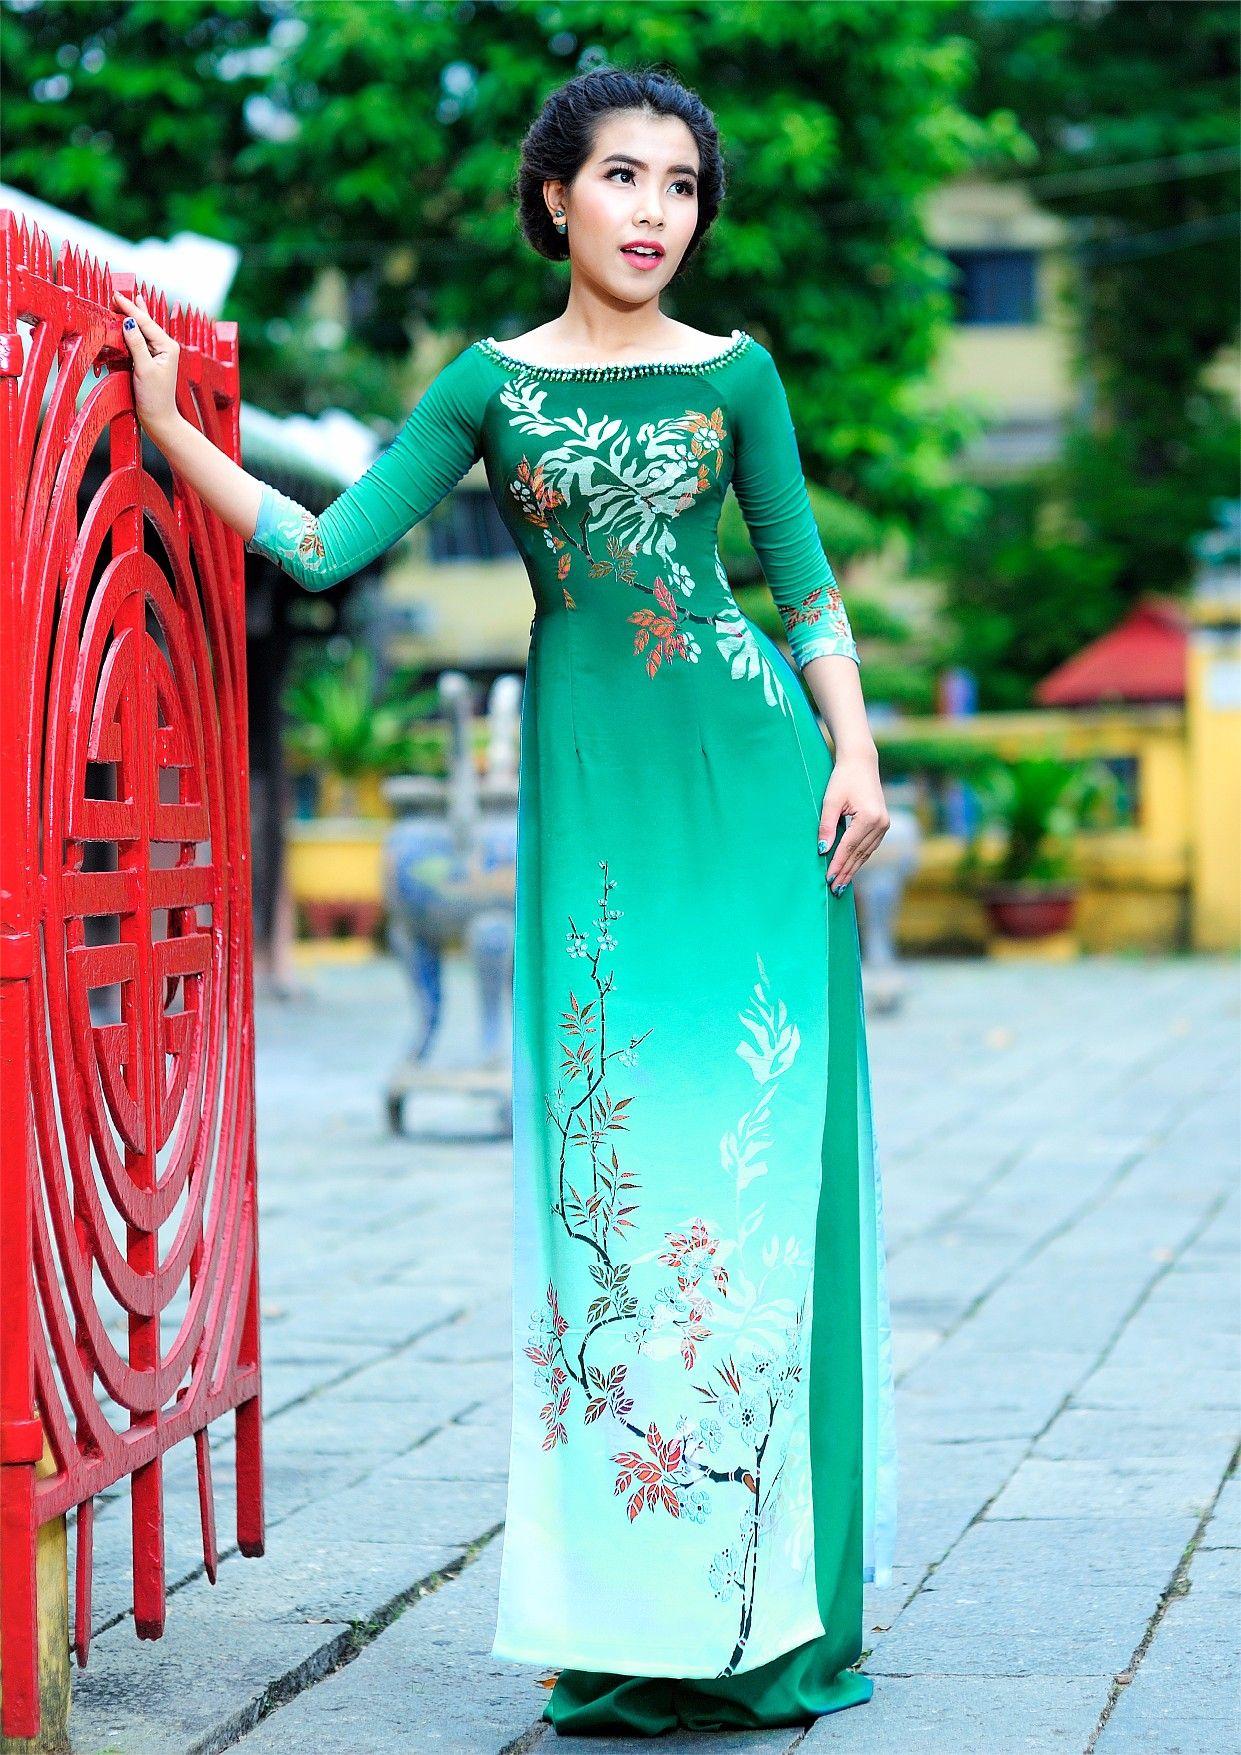 Pin by AMBER TRAN on Vietnamese Ao Dai-Vietnamese